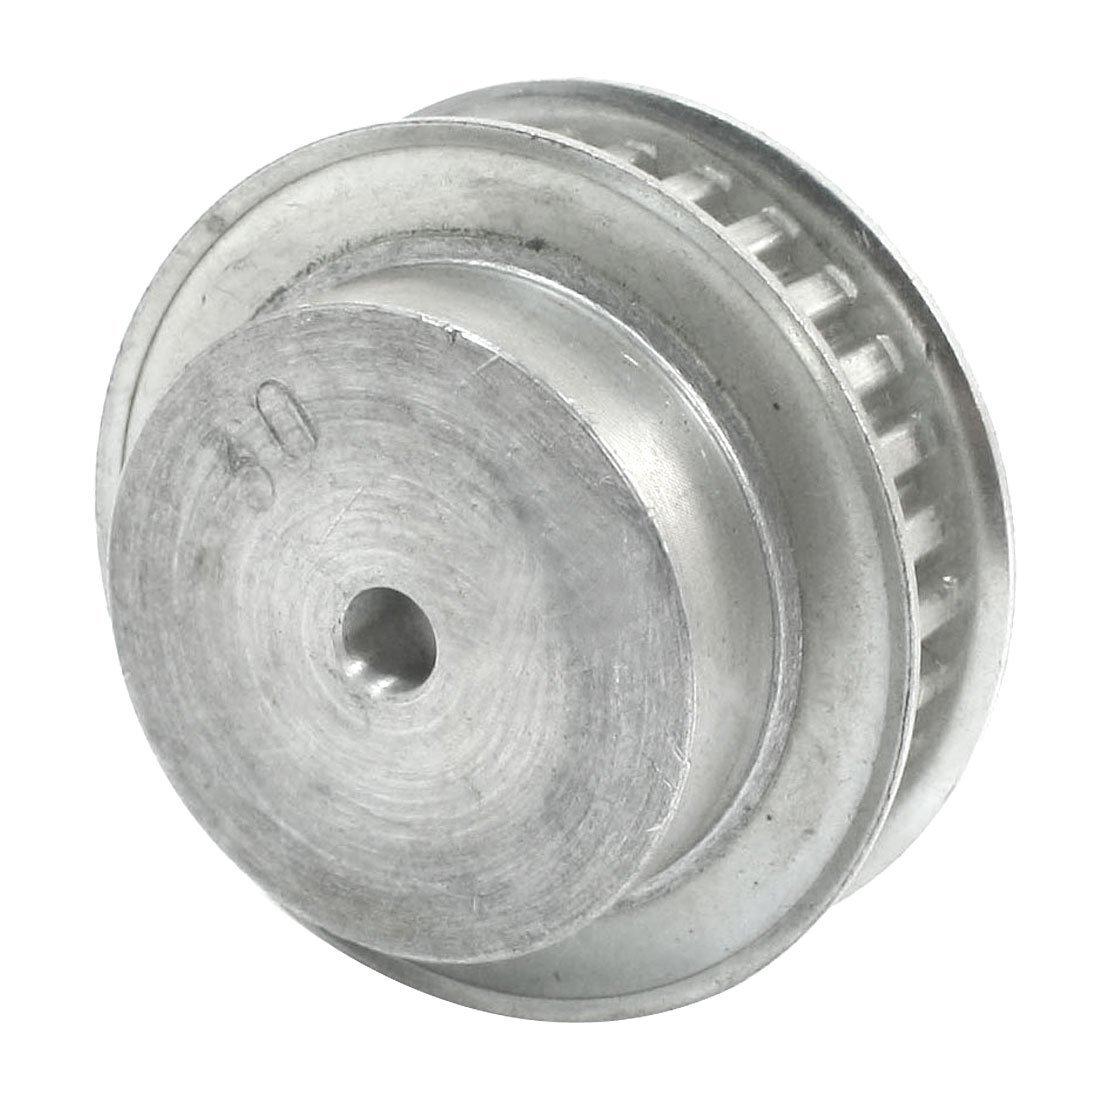 Stepper Motor 30 Teeth 6mm Bore XL Type Aluminum Timing Belt Pulley